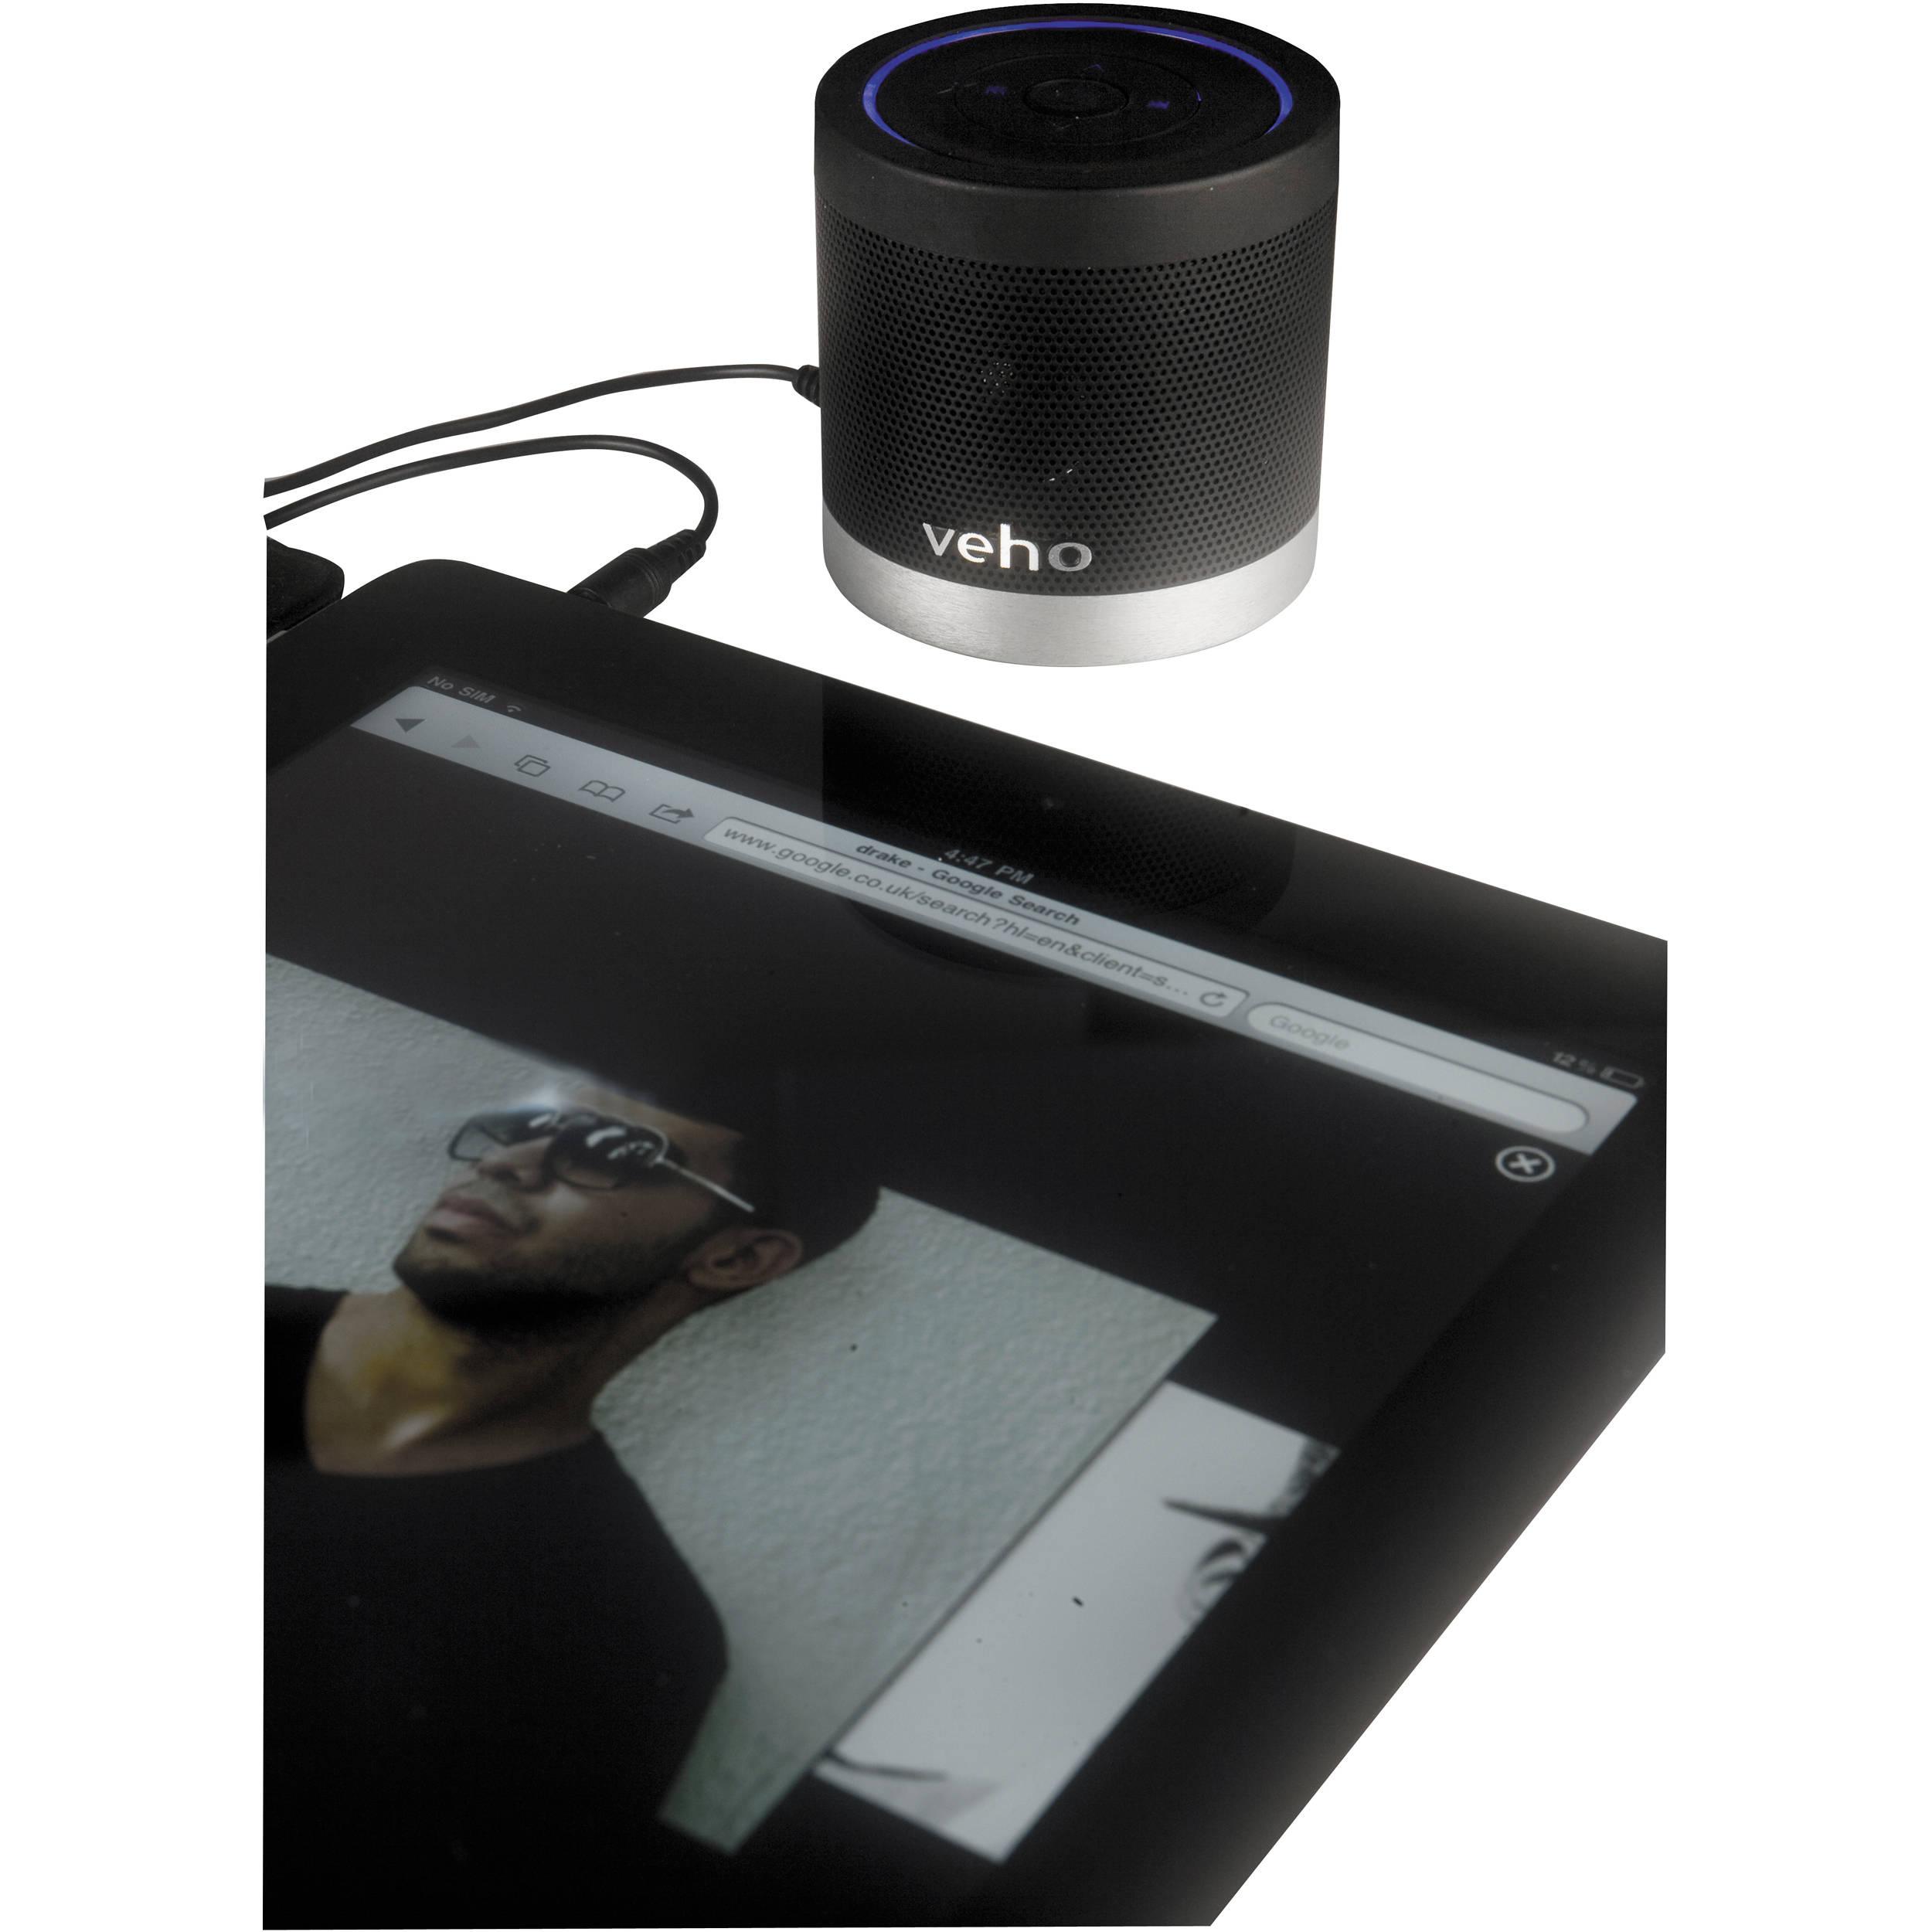 Veho 360 M4 Portable Bluetooth Wireless Speaker Black VSS-009-360BT